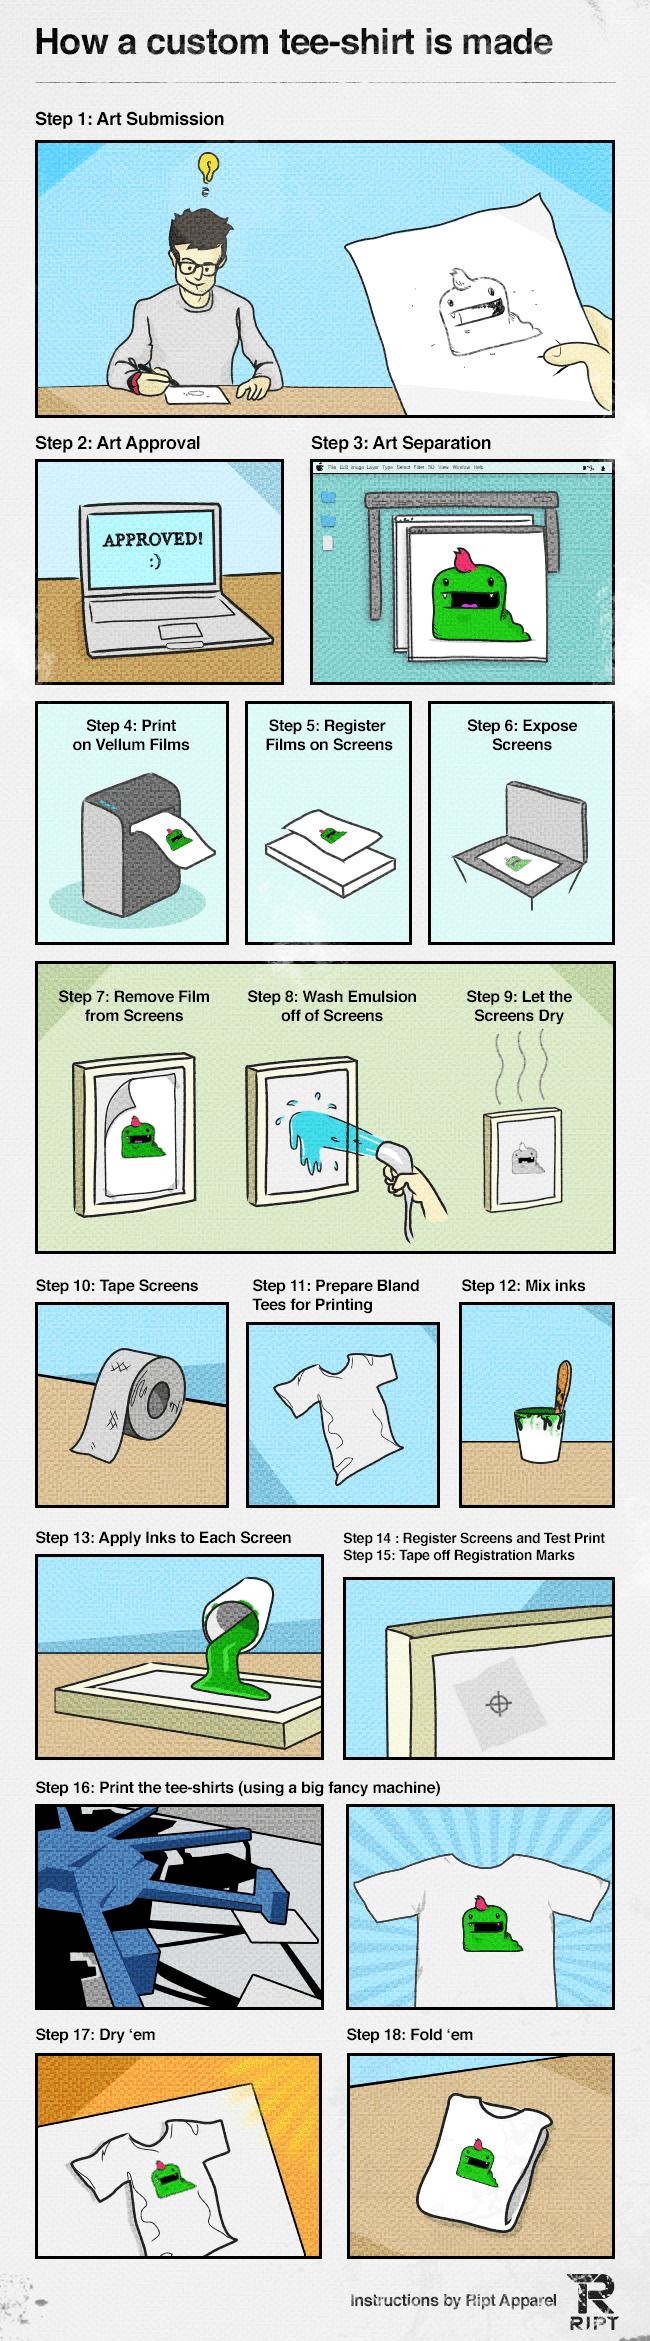 custom-t-shirt-design-process-infographic